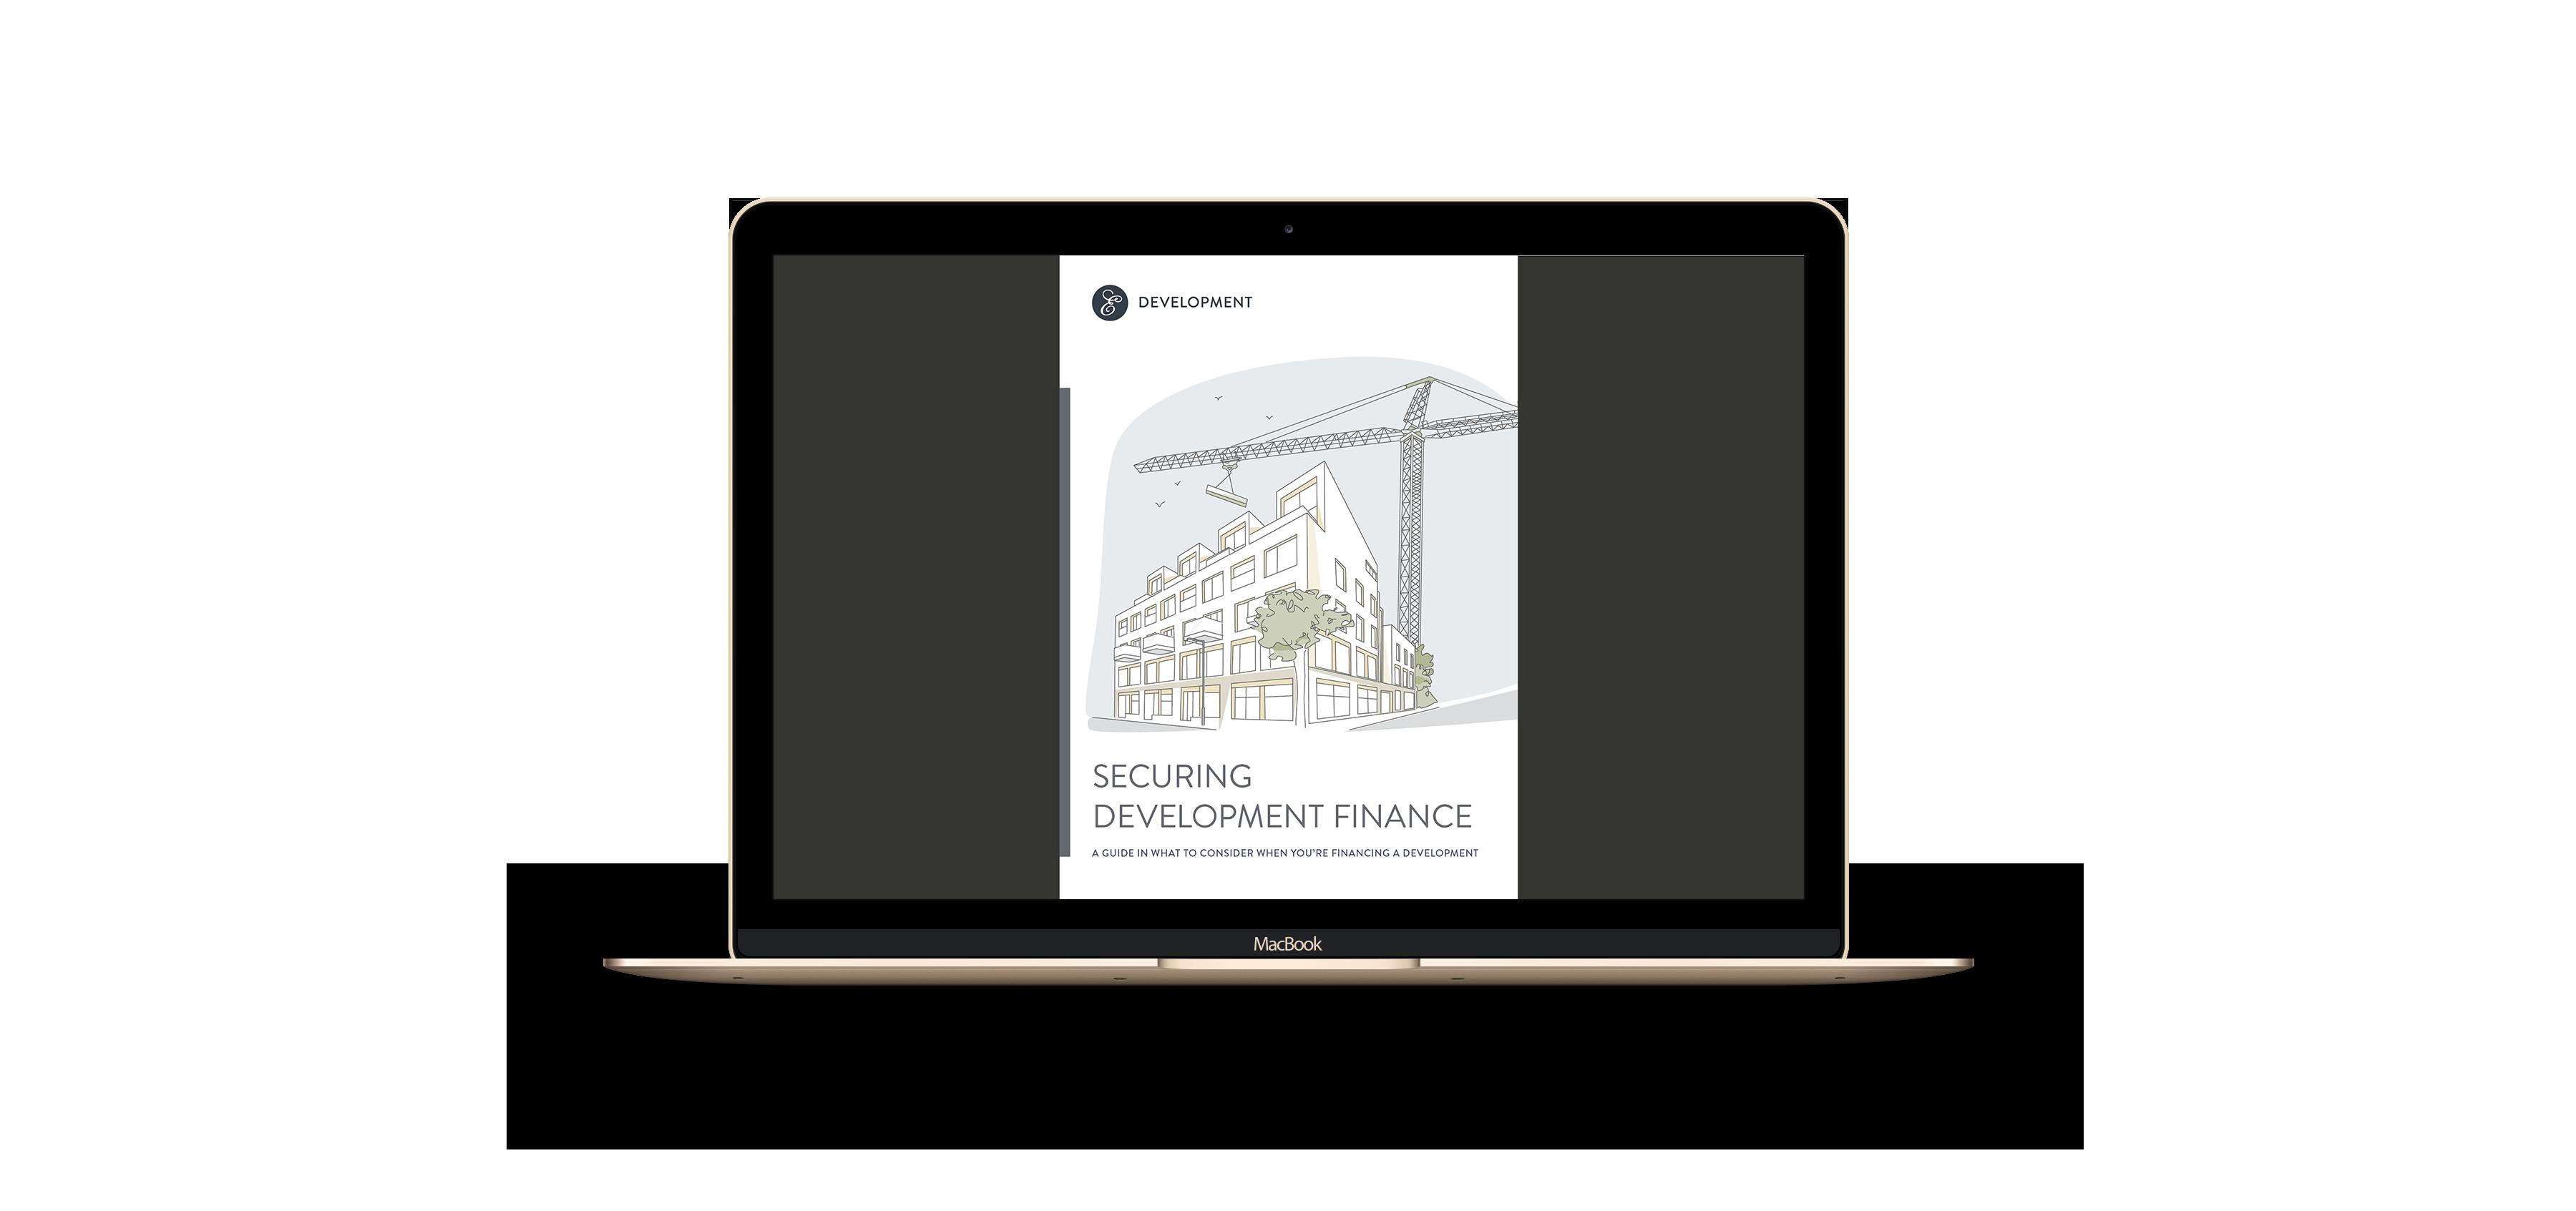 DevelopmentFinance_Guide_ibook.png